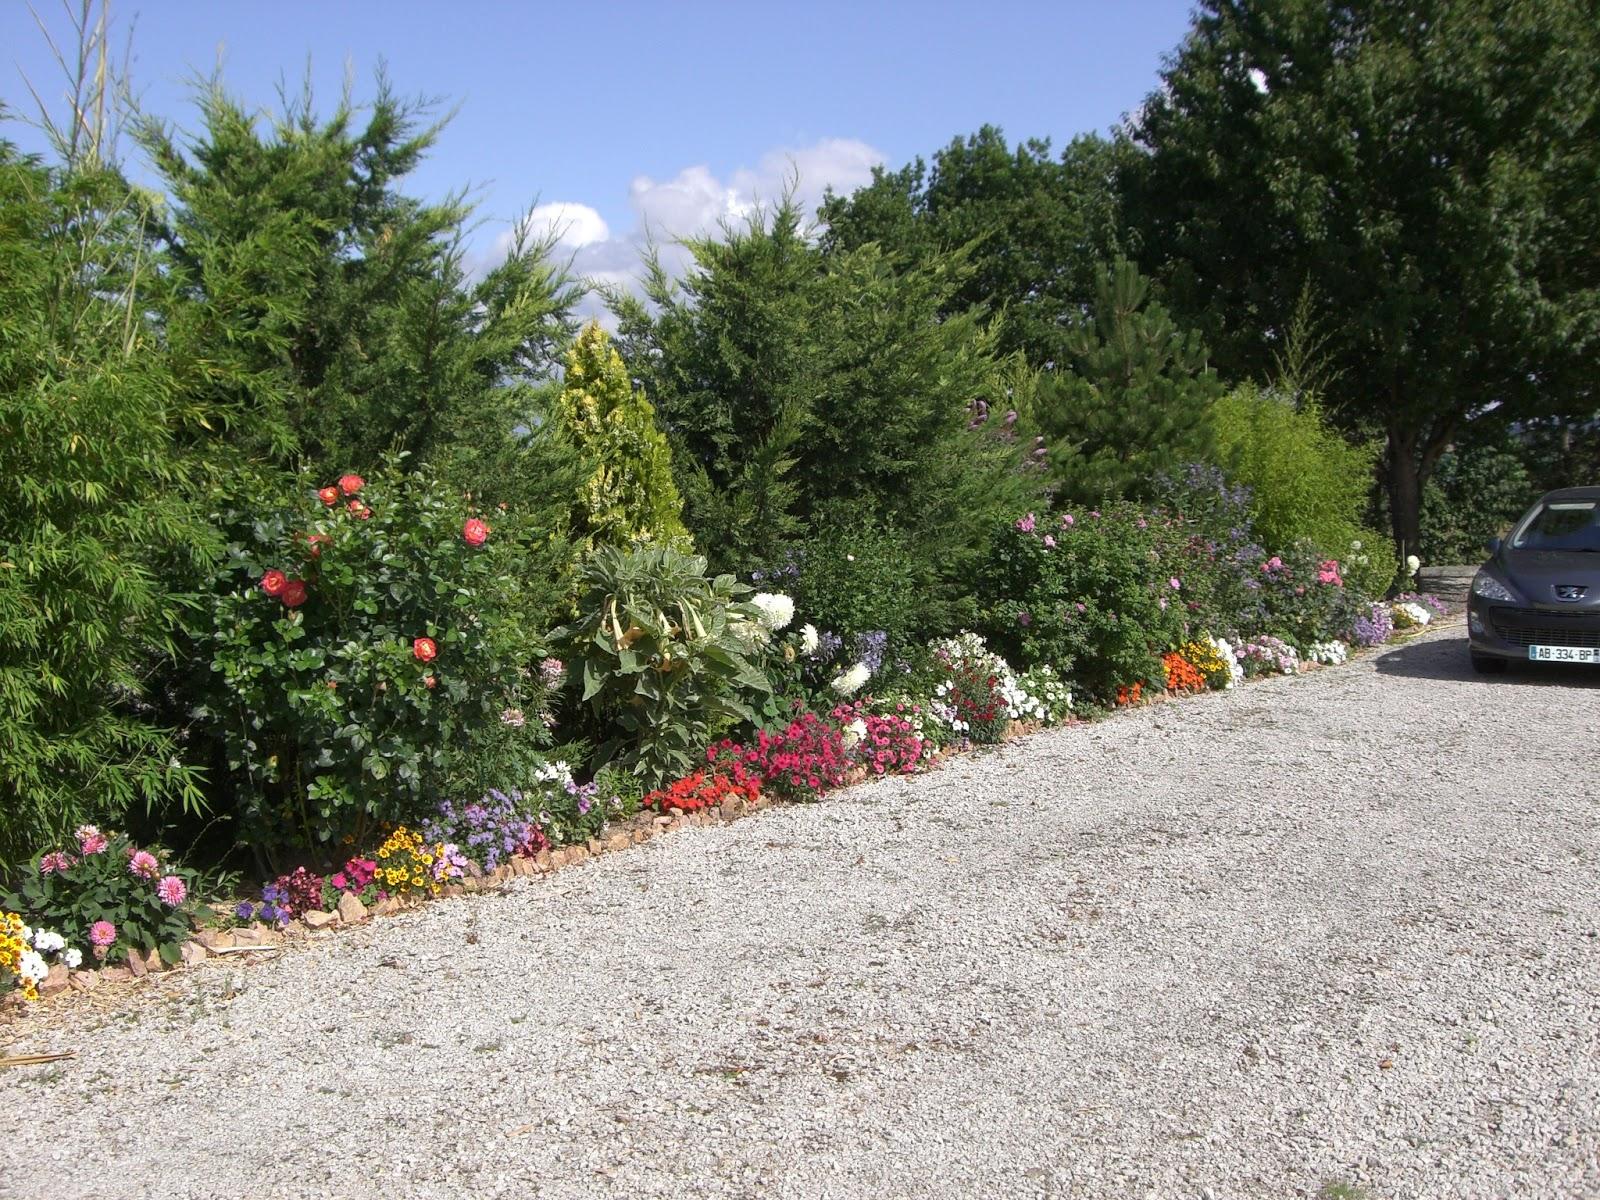 Roses du jardin ch neland l 39 t 2009 - Jardin de chen ...